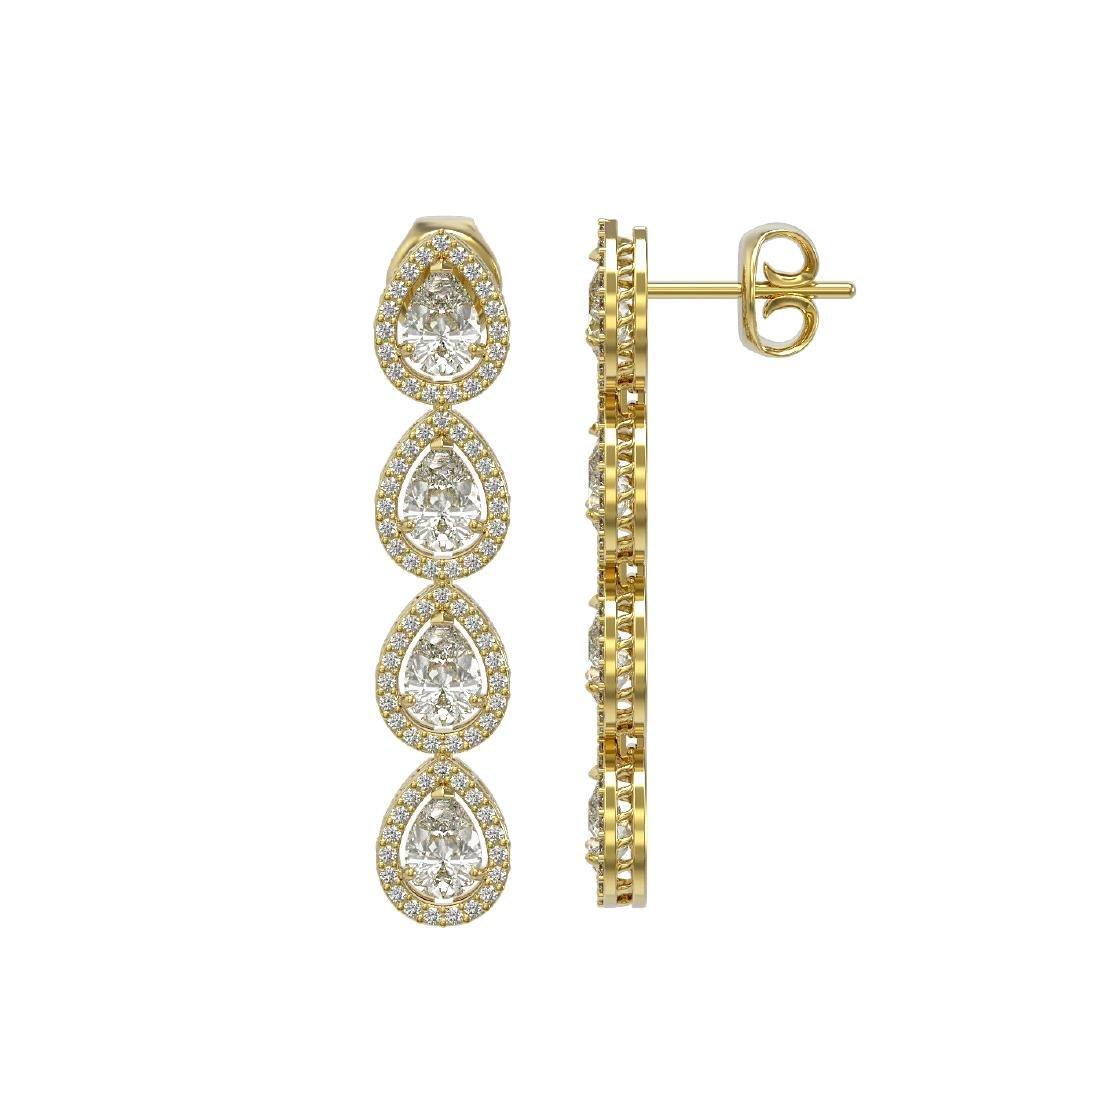 6.01 CTW Pear Diamond Designer Earrings 18K Yellow Gold - 2